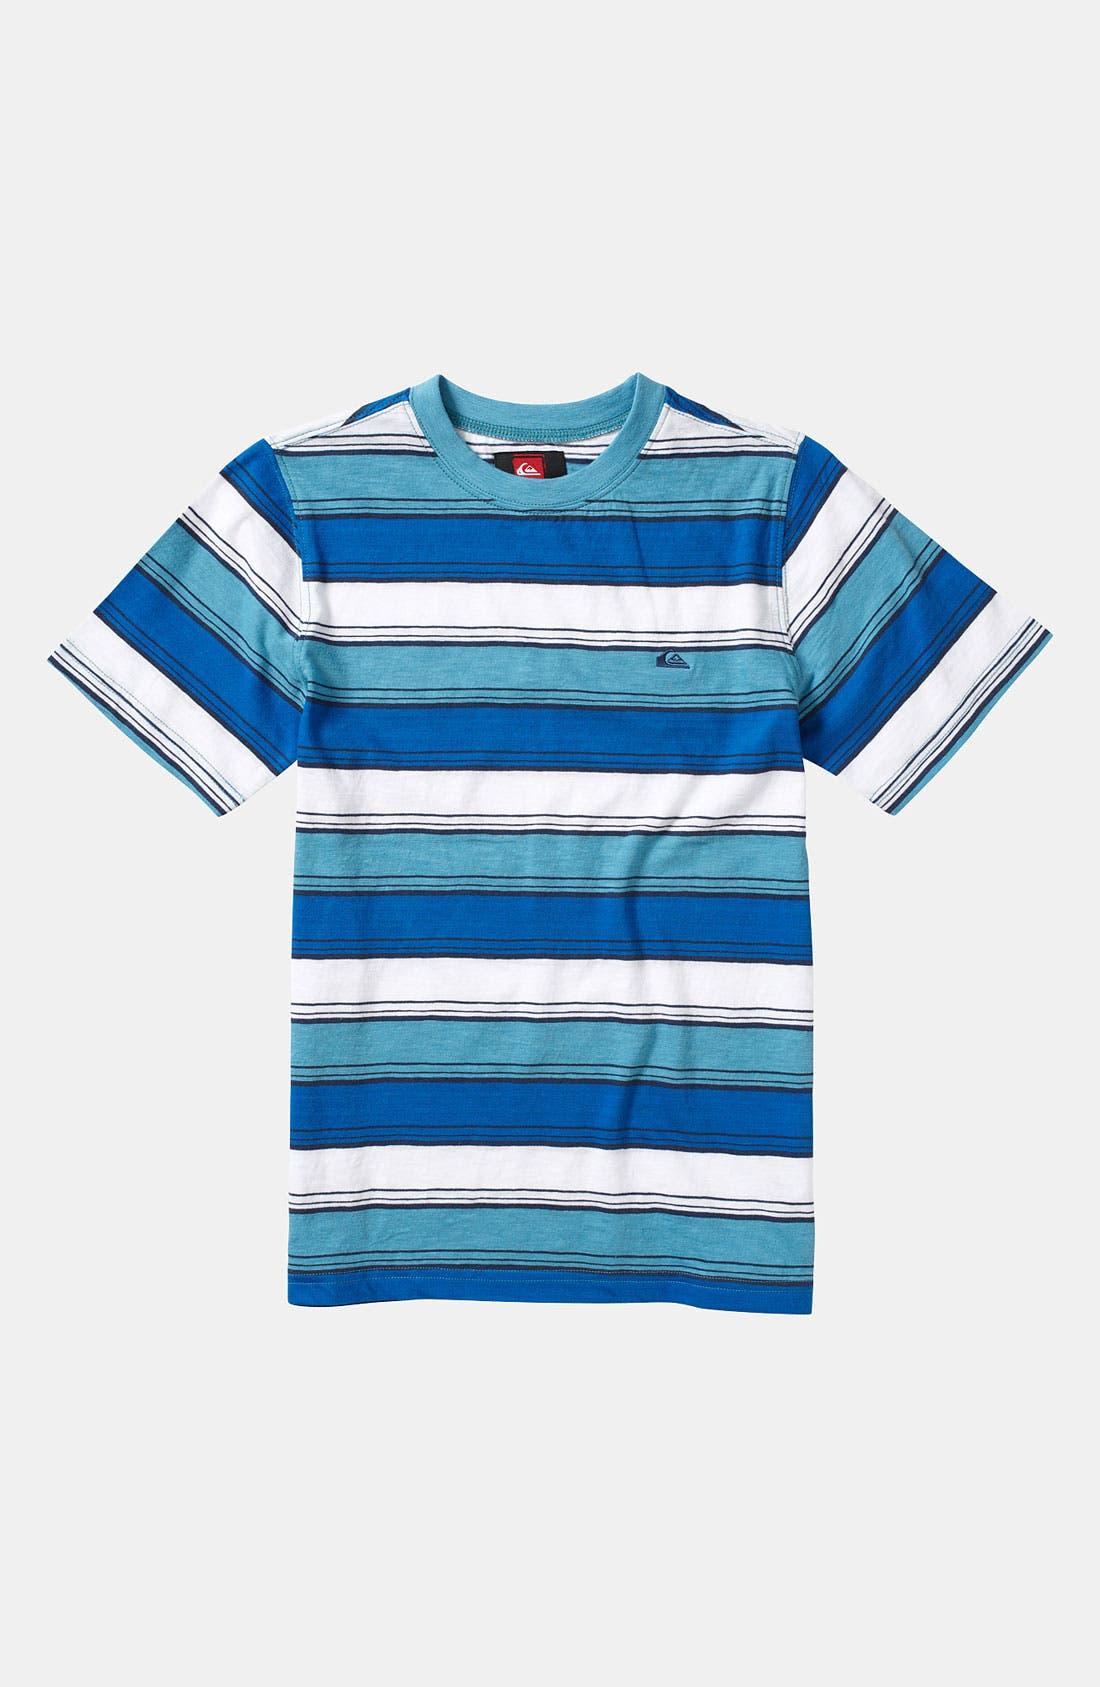 Main Image - Quiksilver 'Downside' Stripe Shirt (Toddler)